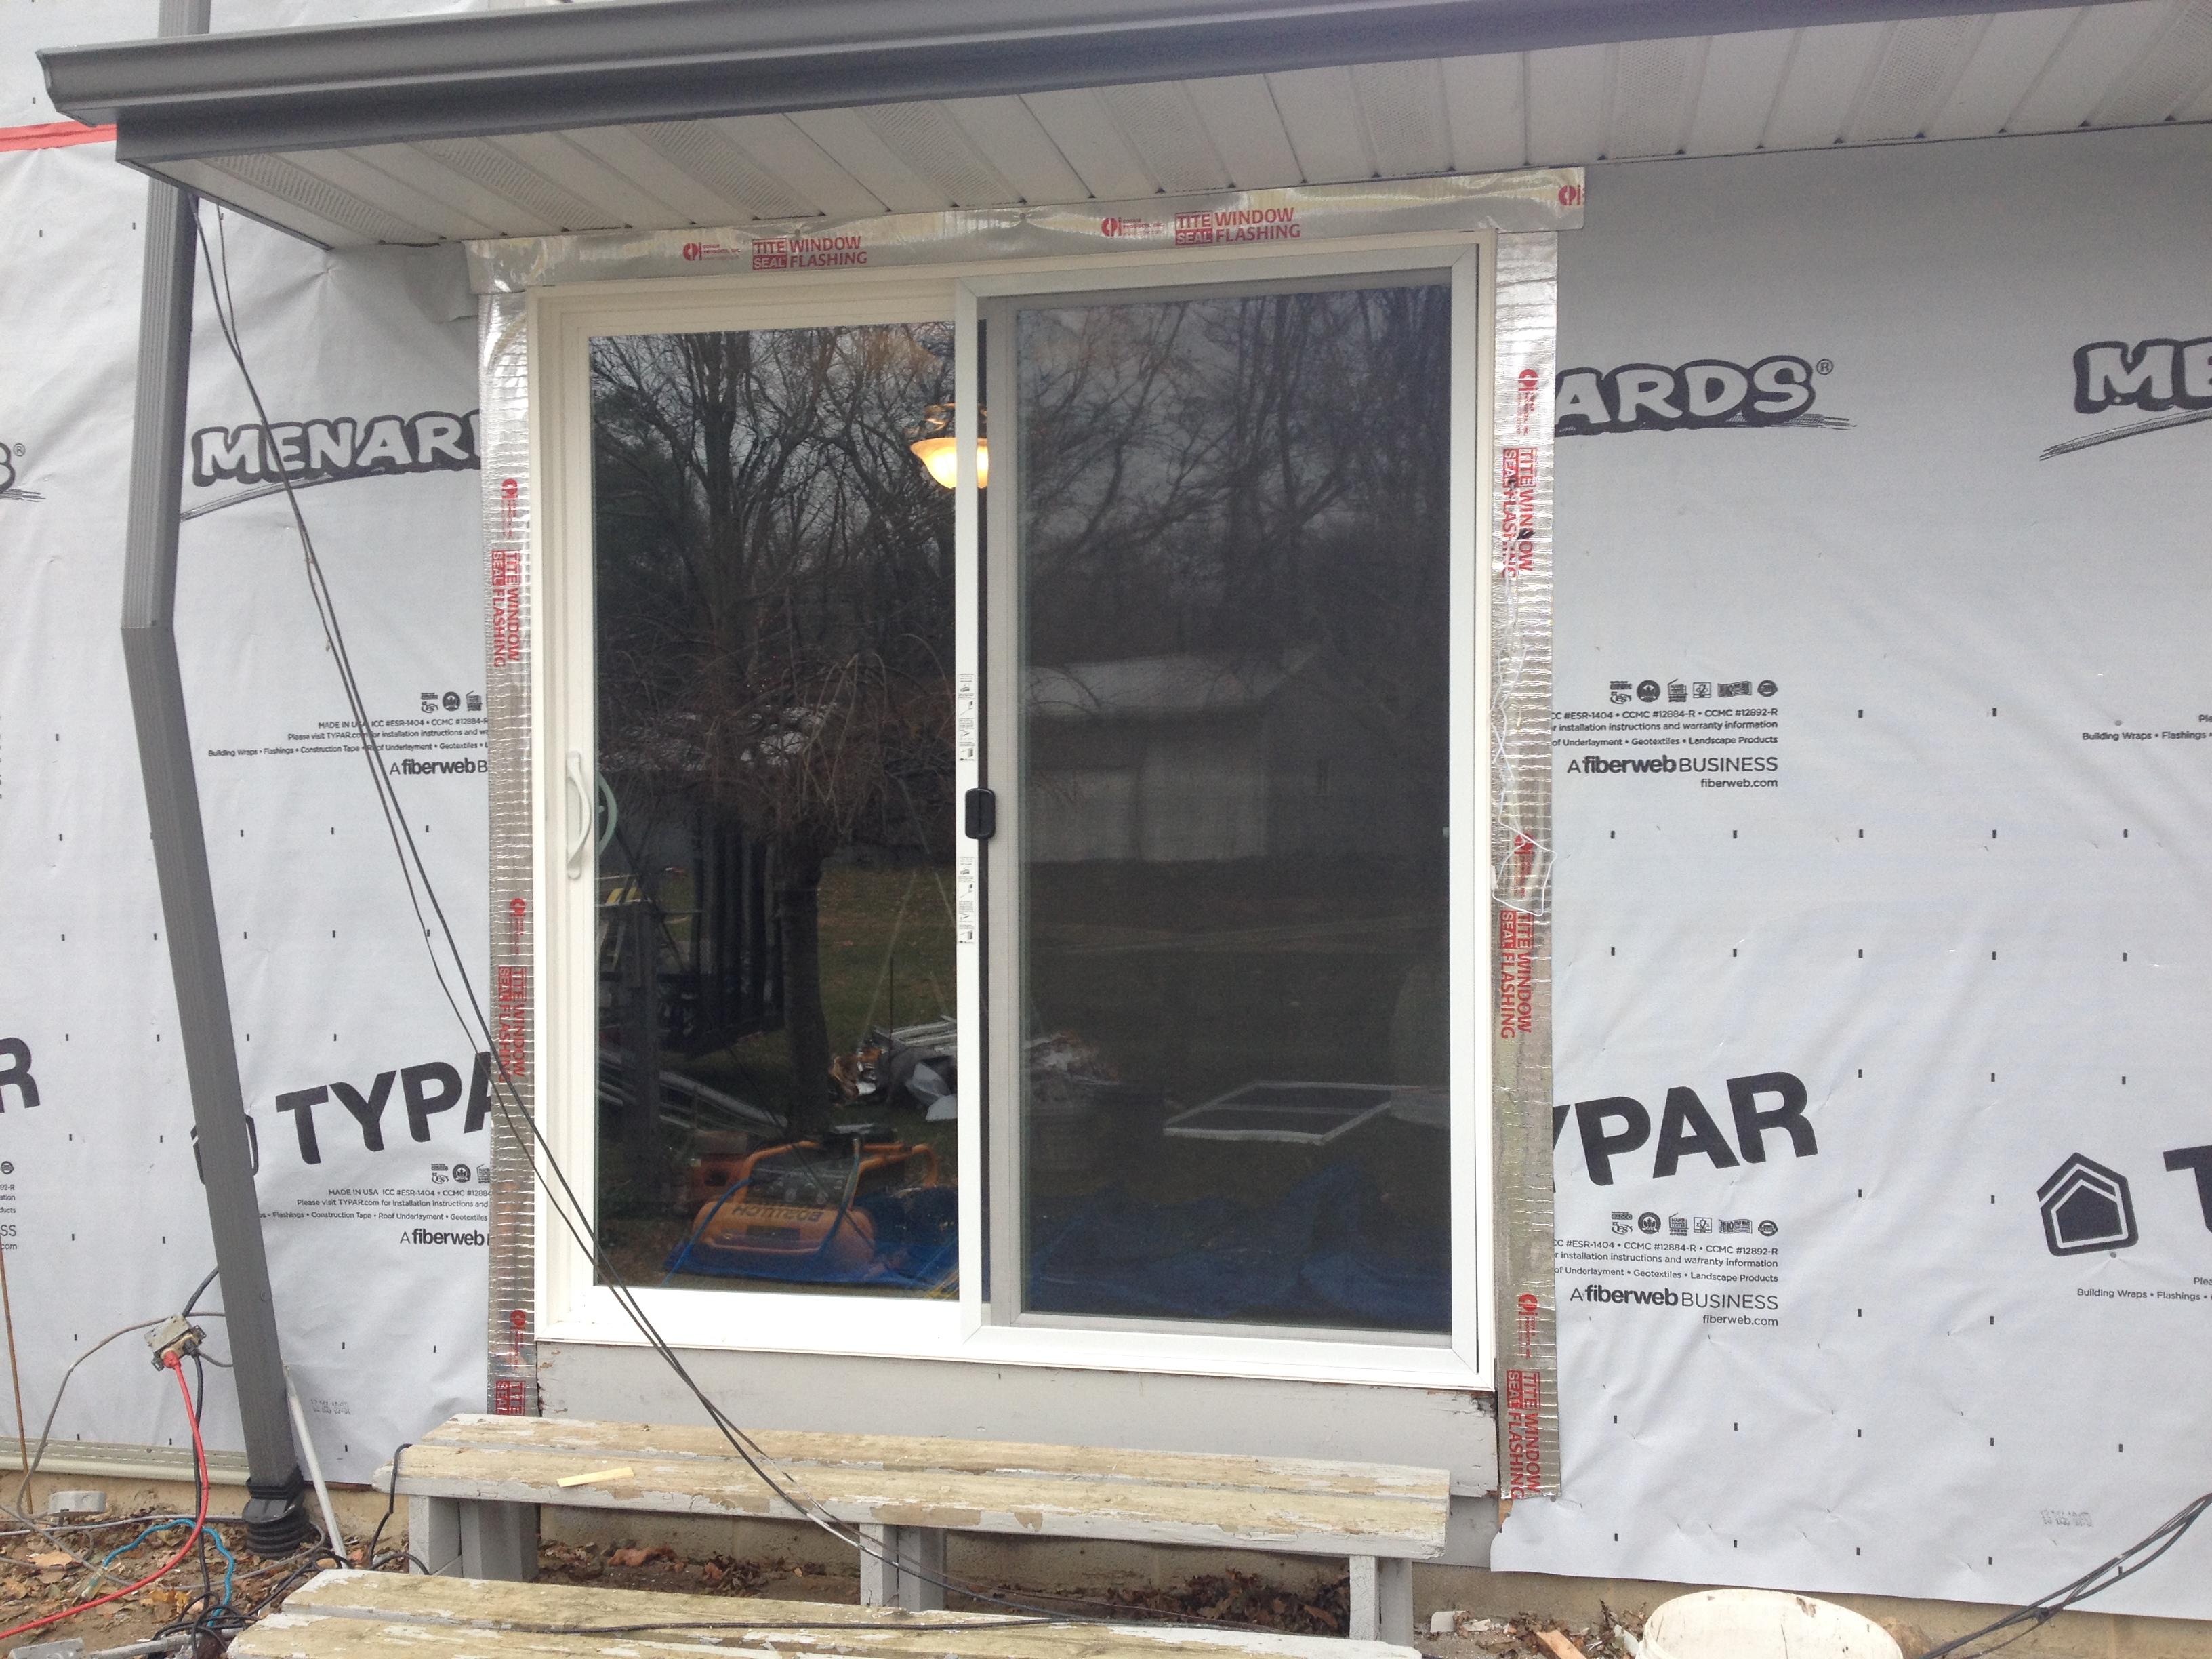 Jeld wen sliding patio door installation edgerton ohio jeld wen 72 x 80 vinyl sliding patio door edgerton ohio planetlyrics Choice Image